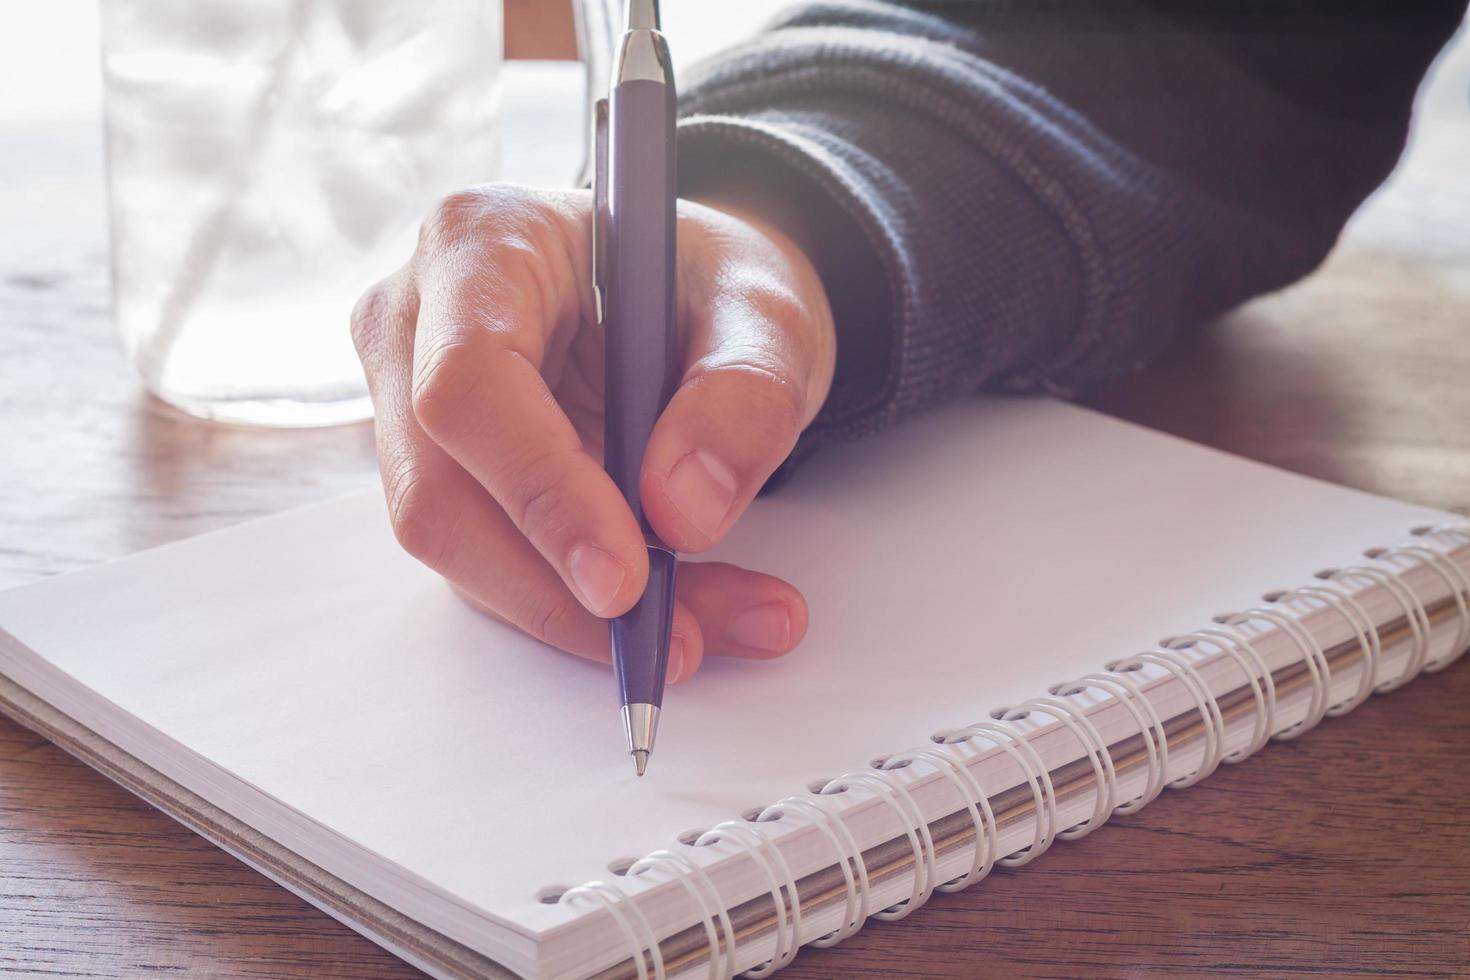 escritura a mano con un bolígrafo morado foto